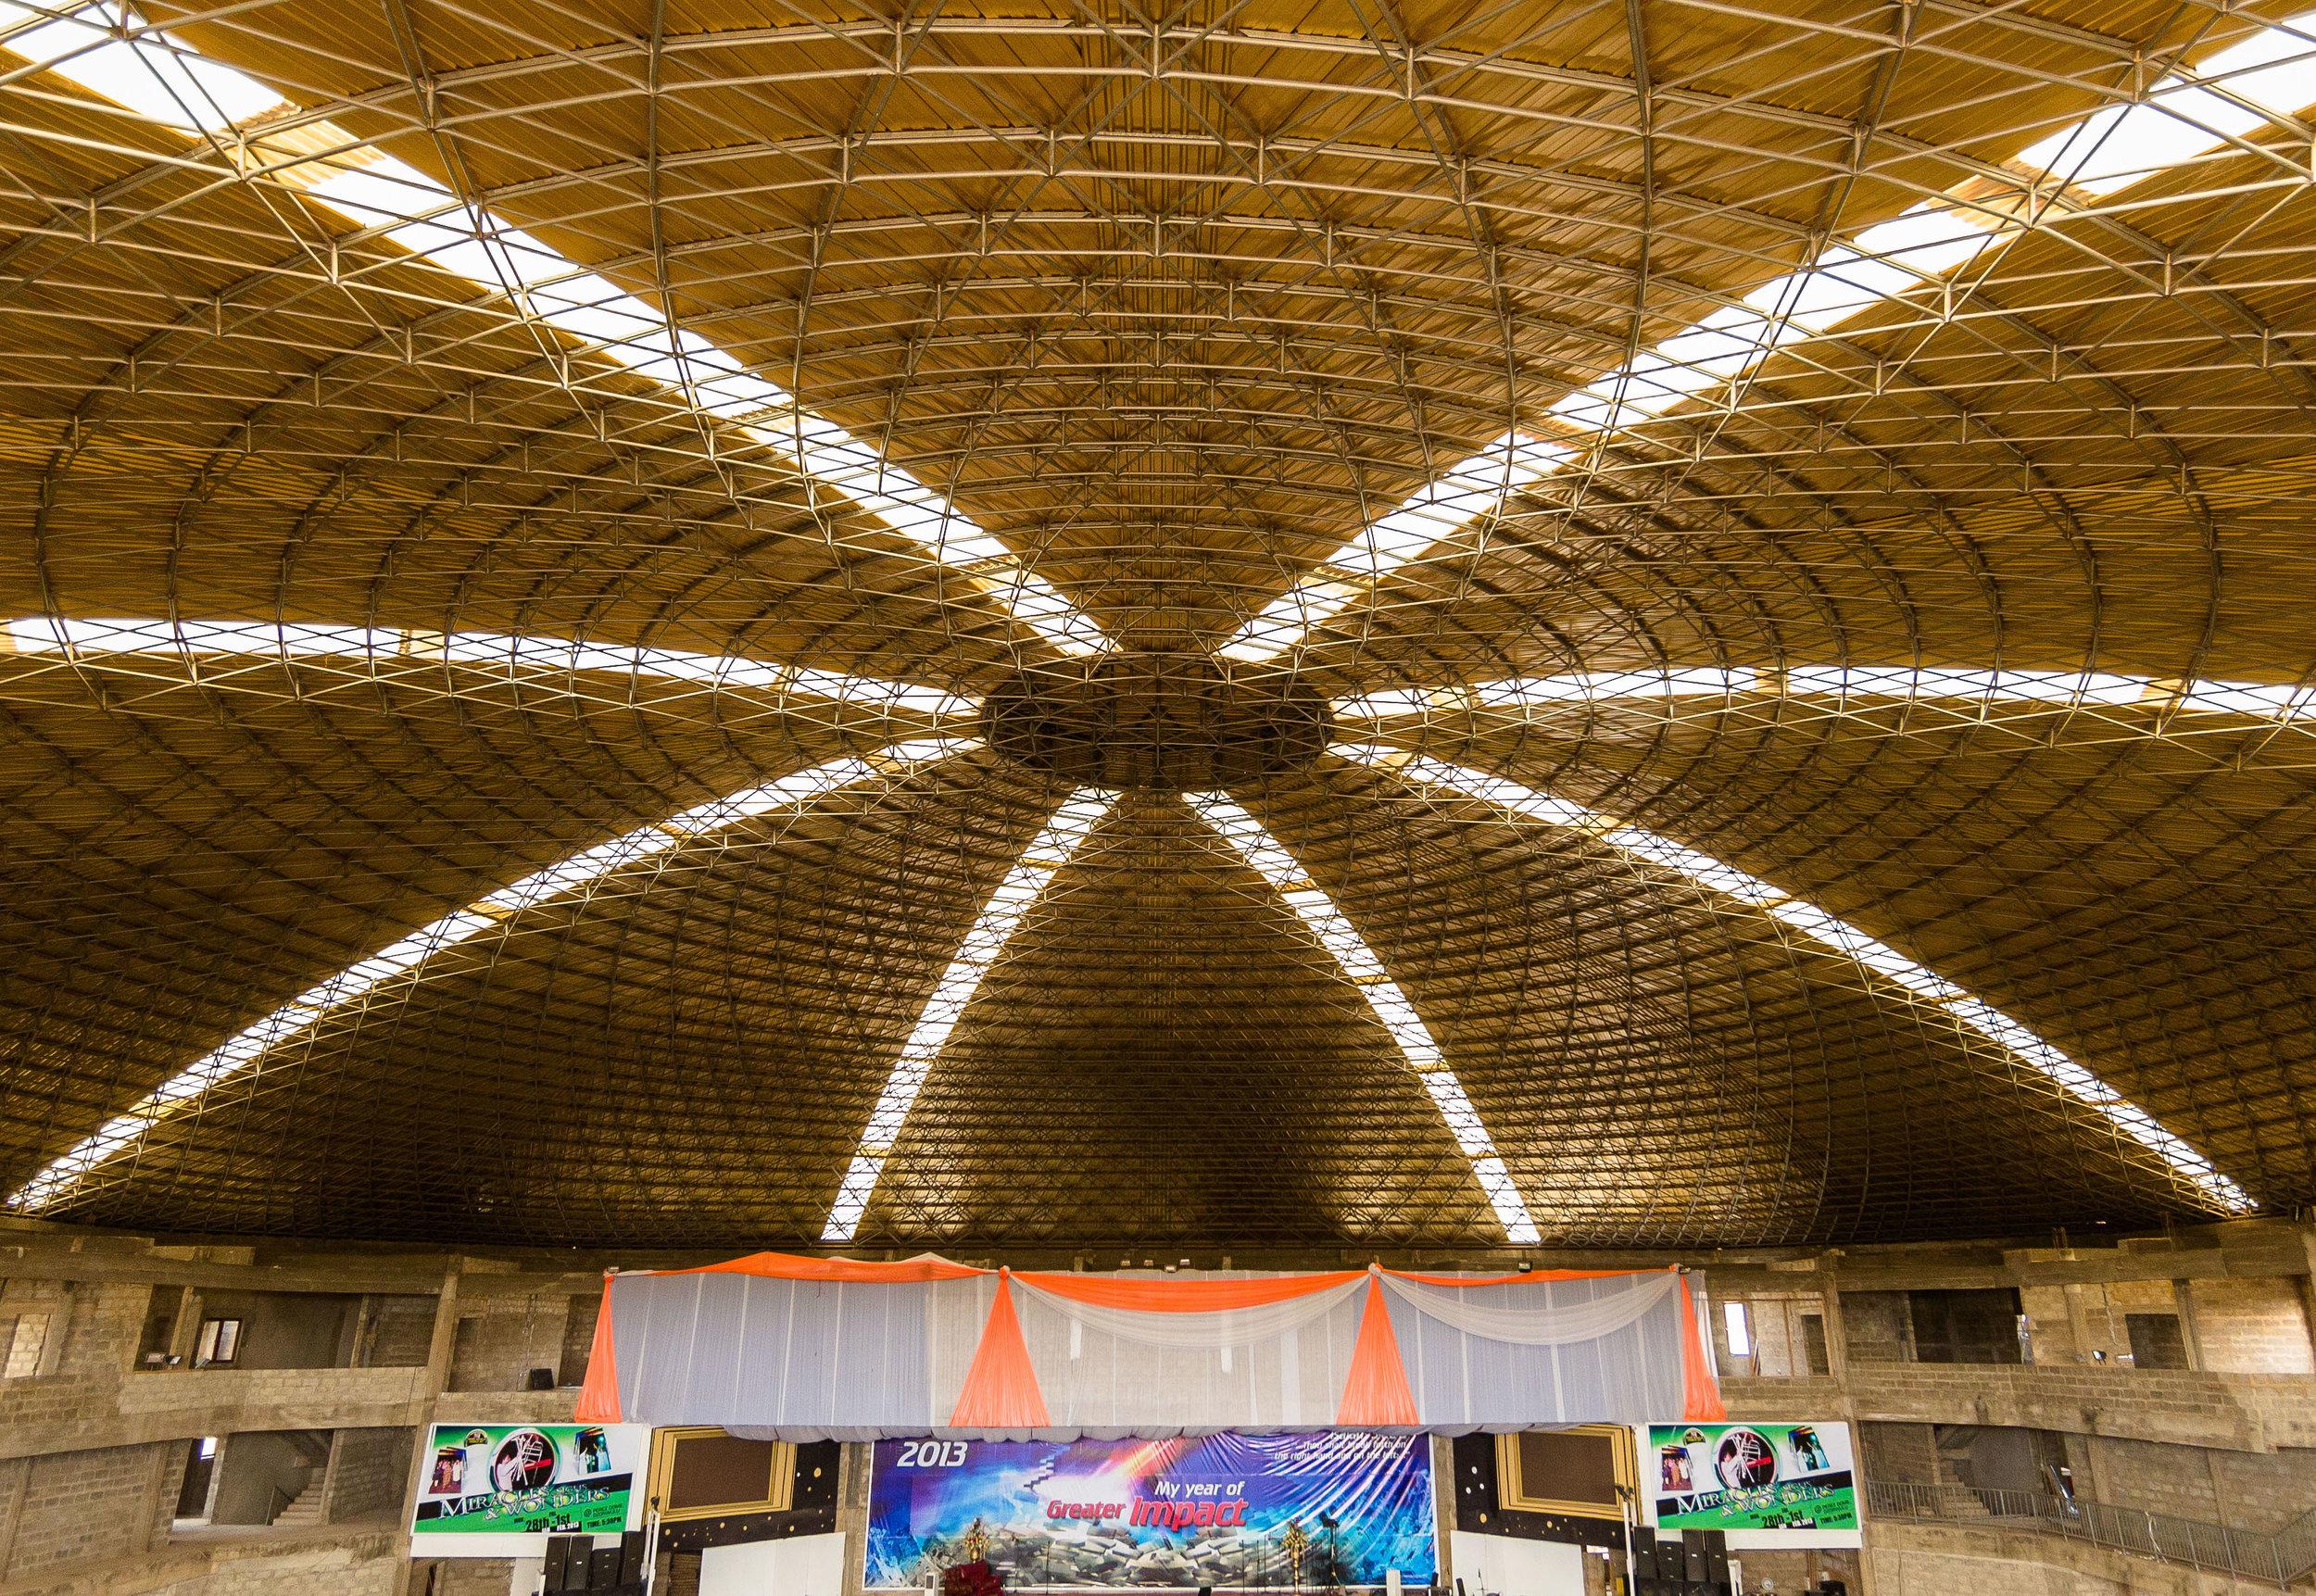 Perez Dome, Accra, Ghana